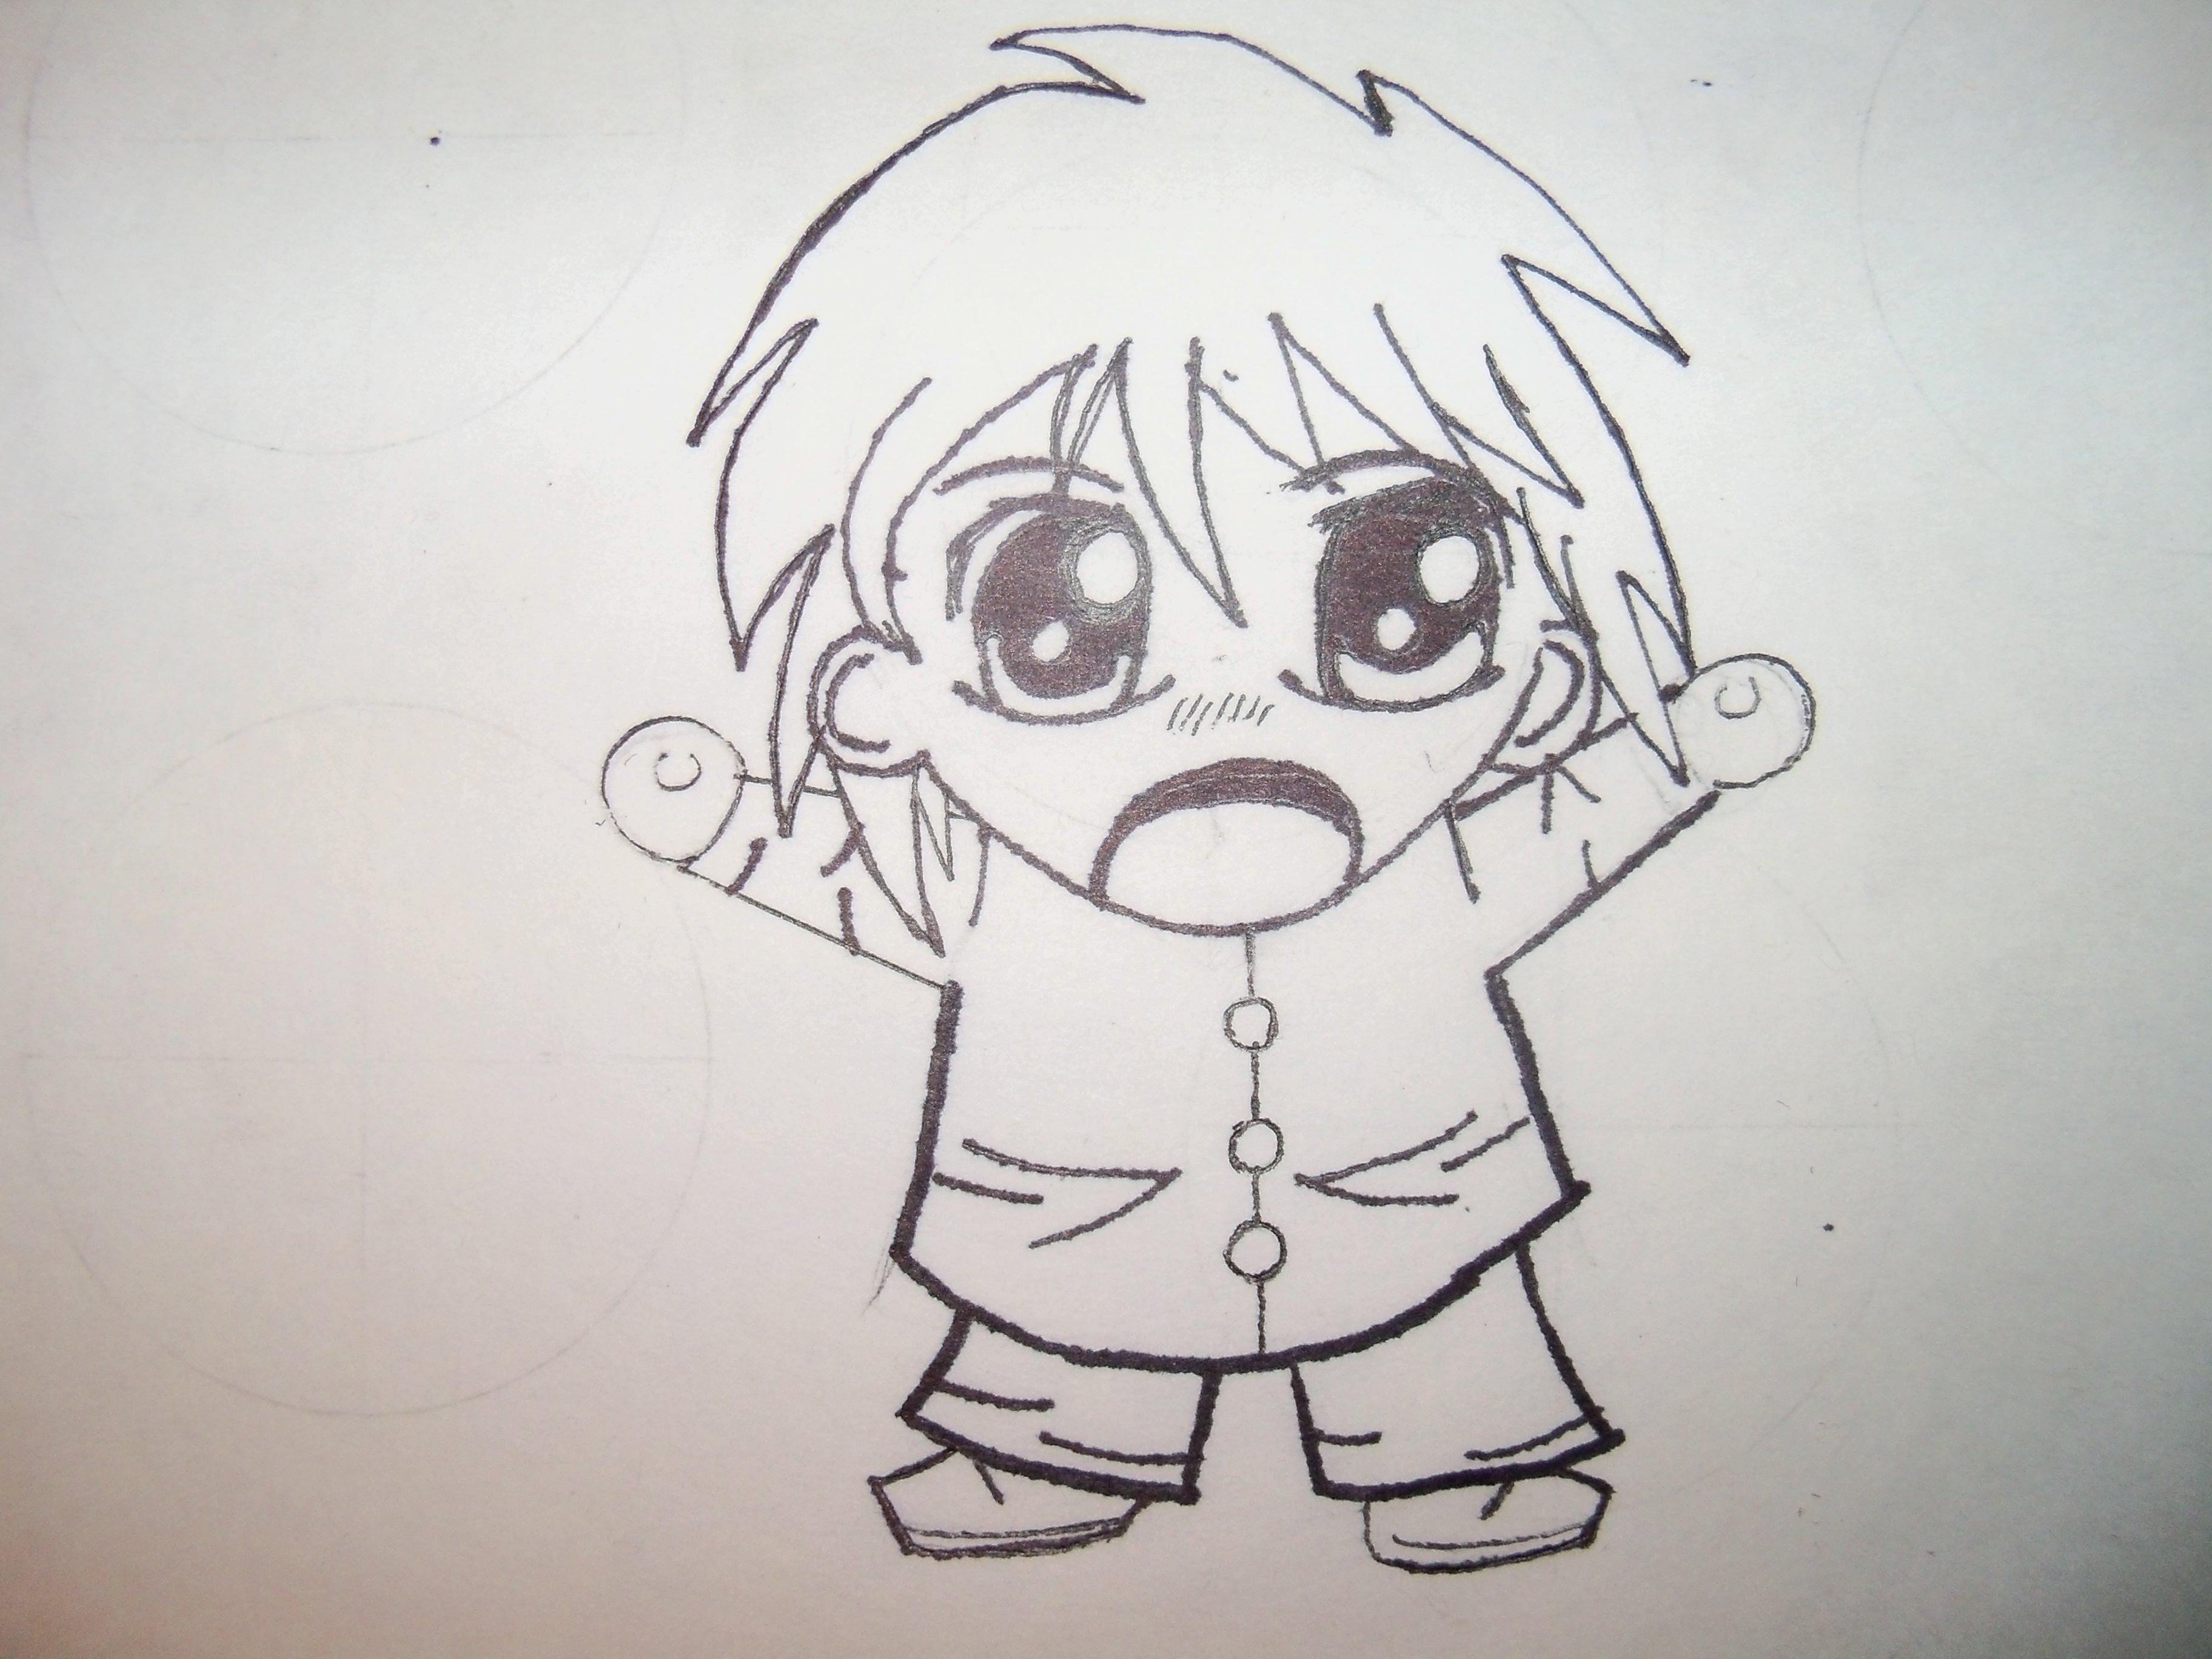 Drawn kopel boyfriend 101_1318[1] General Hell Green :